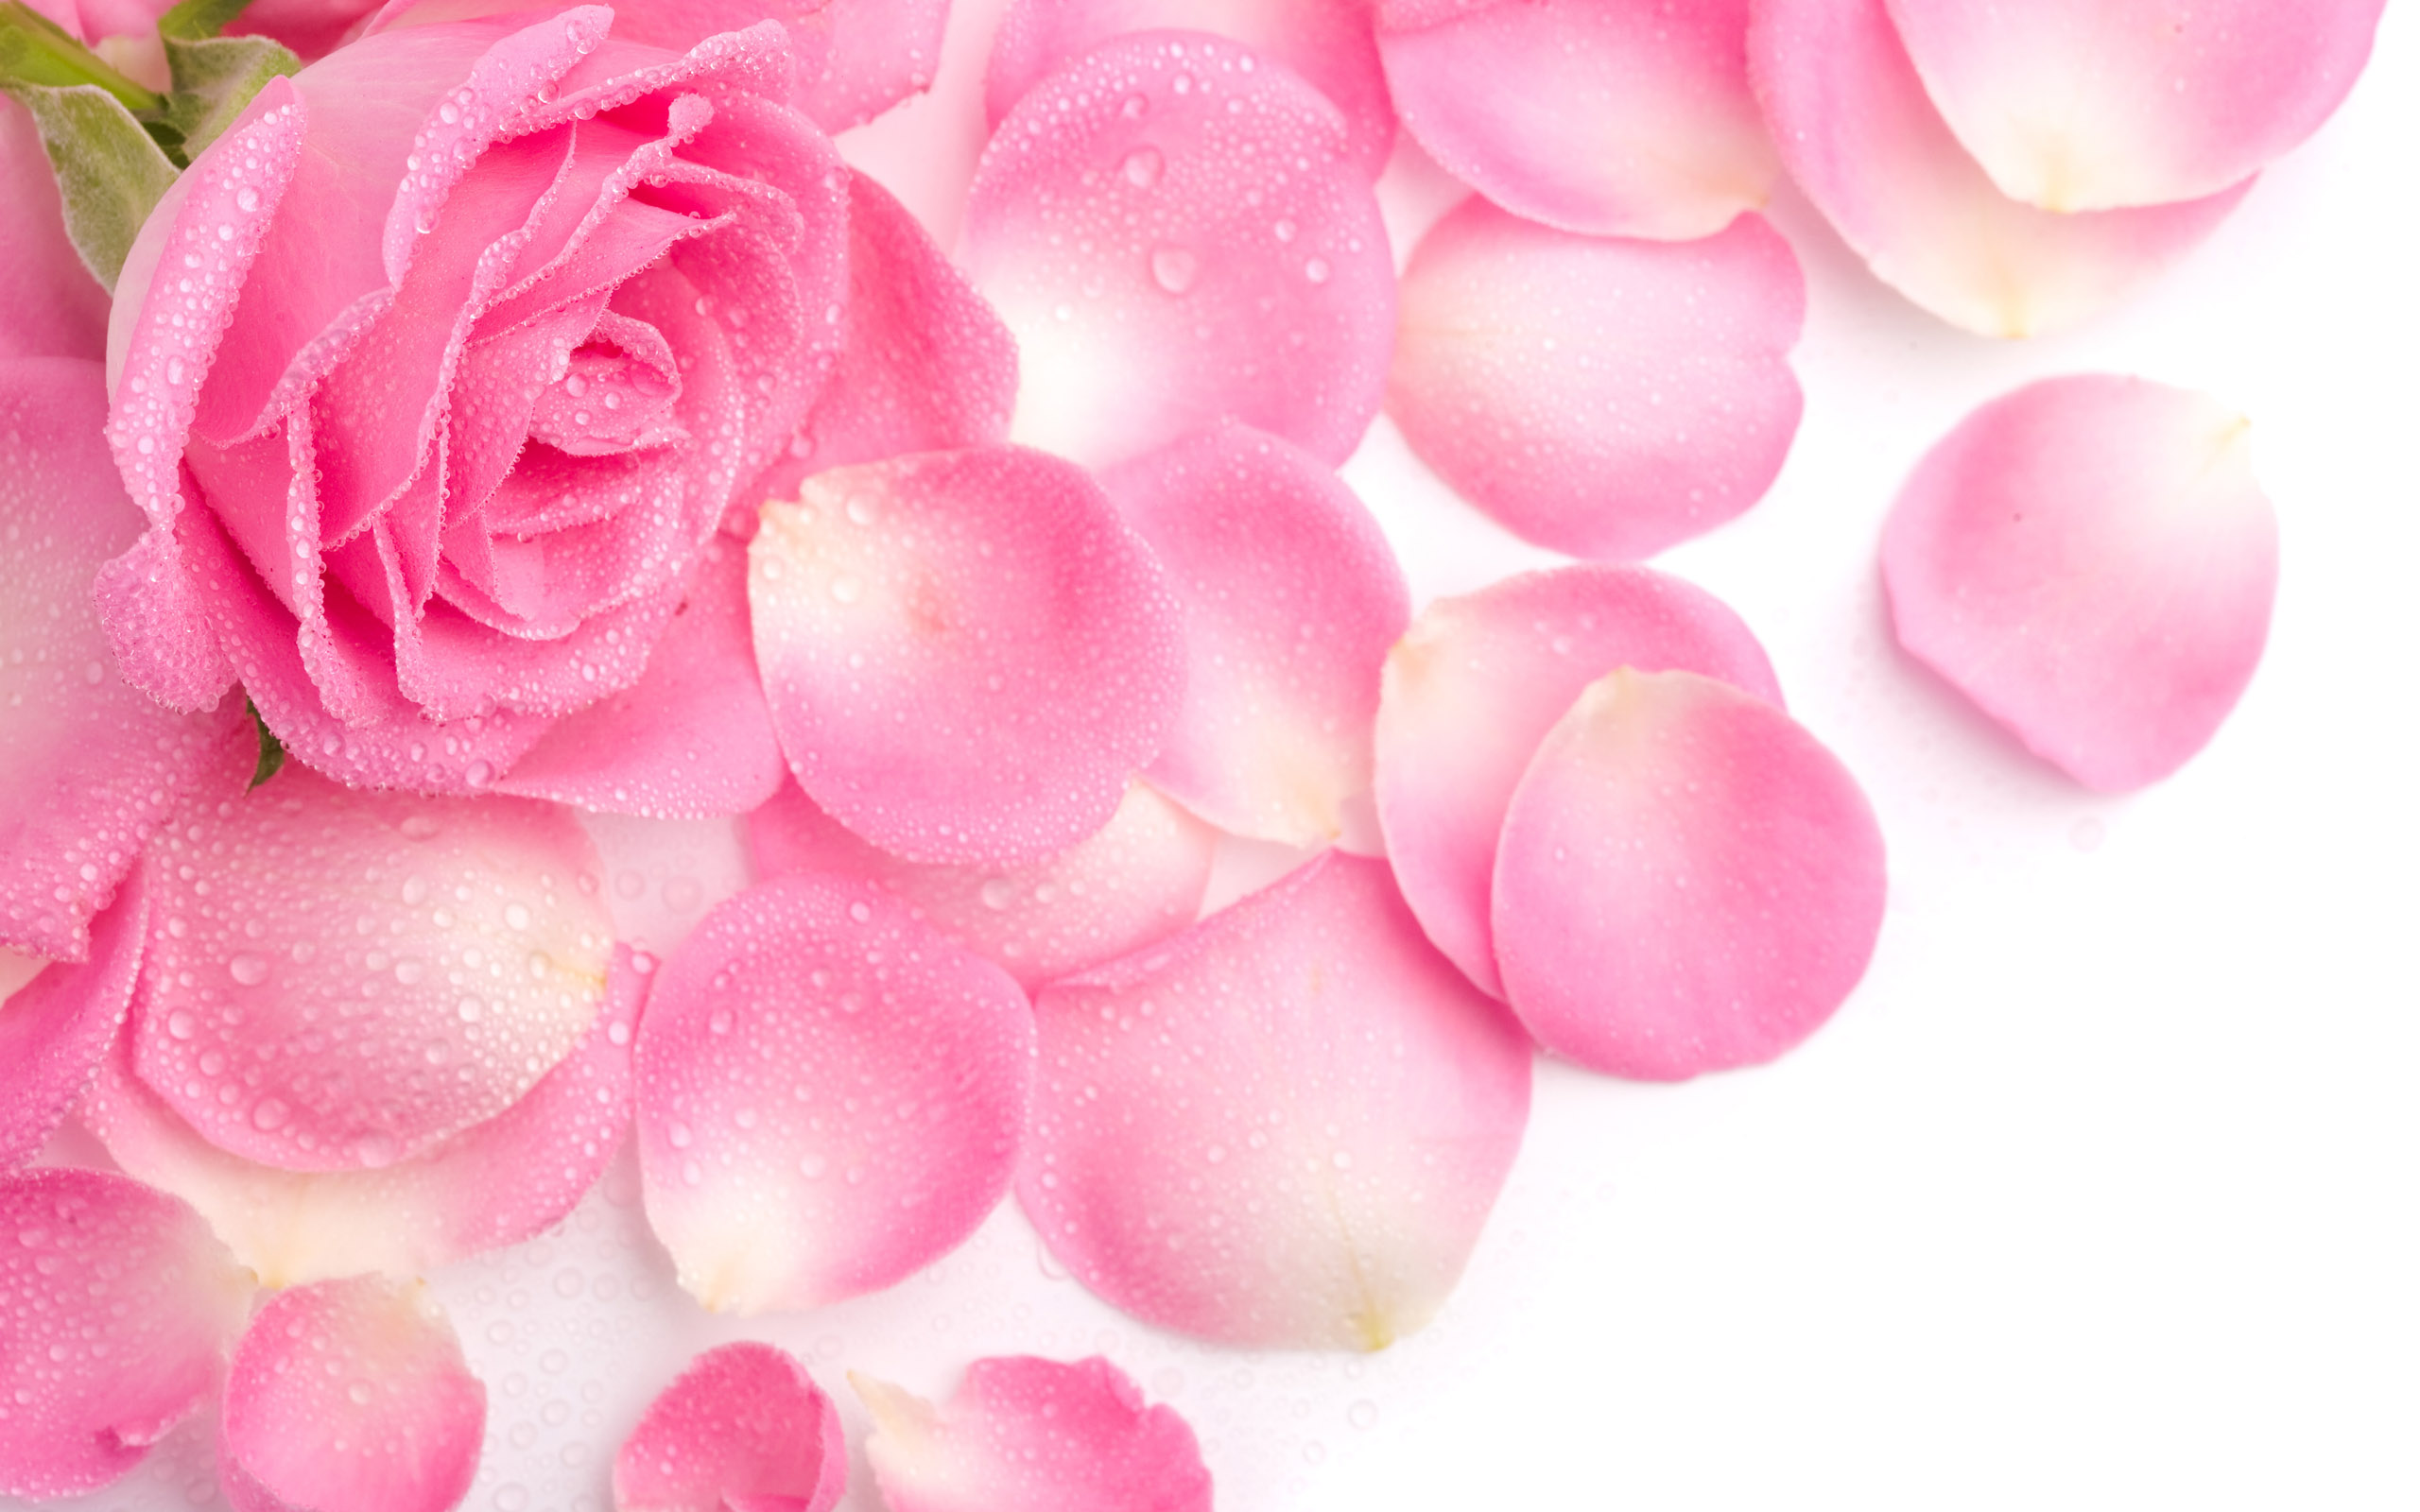 Beautiful Rose Flowers HD Wallpaper